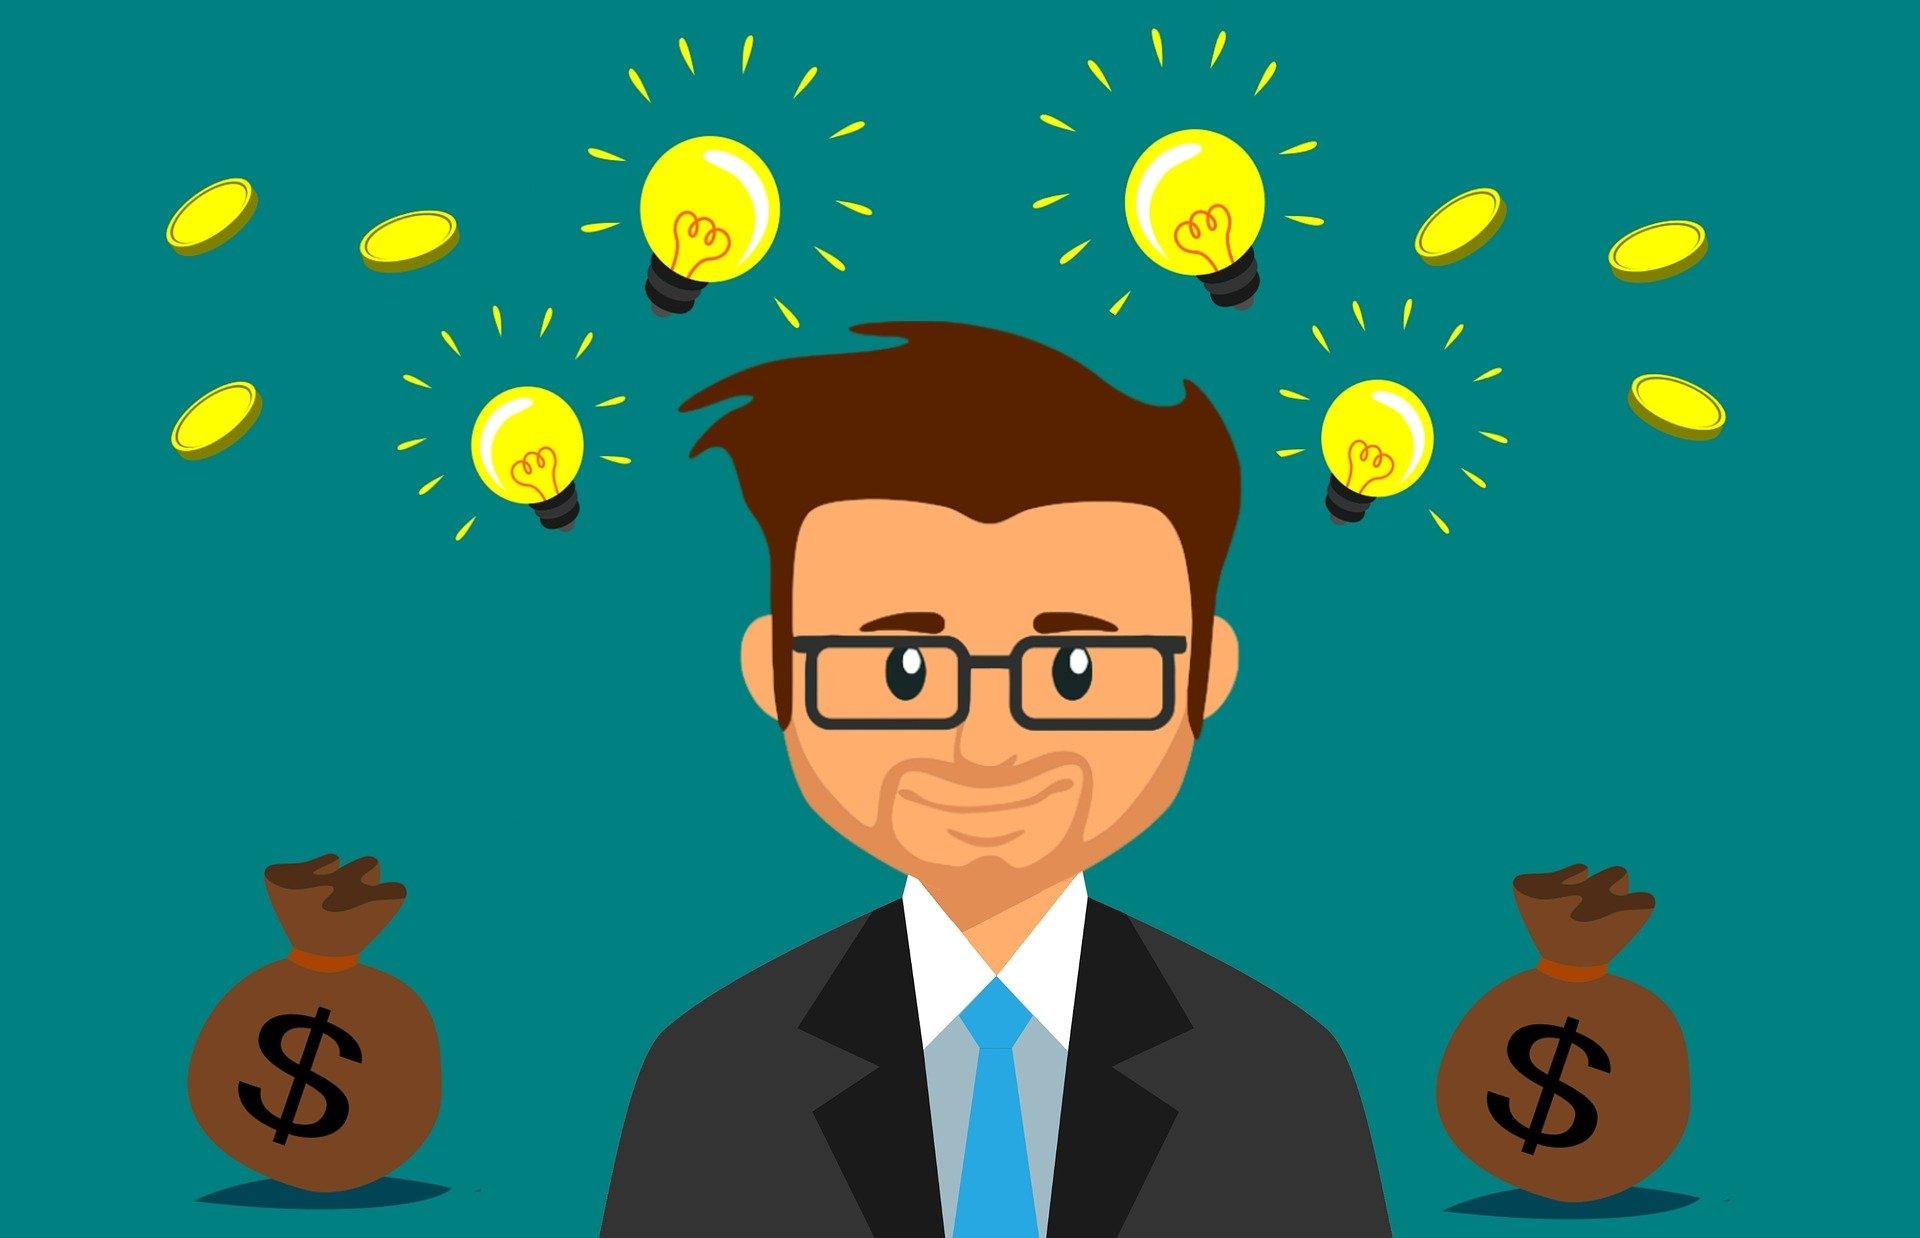 Inversores, empresas, emprendedor